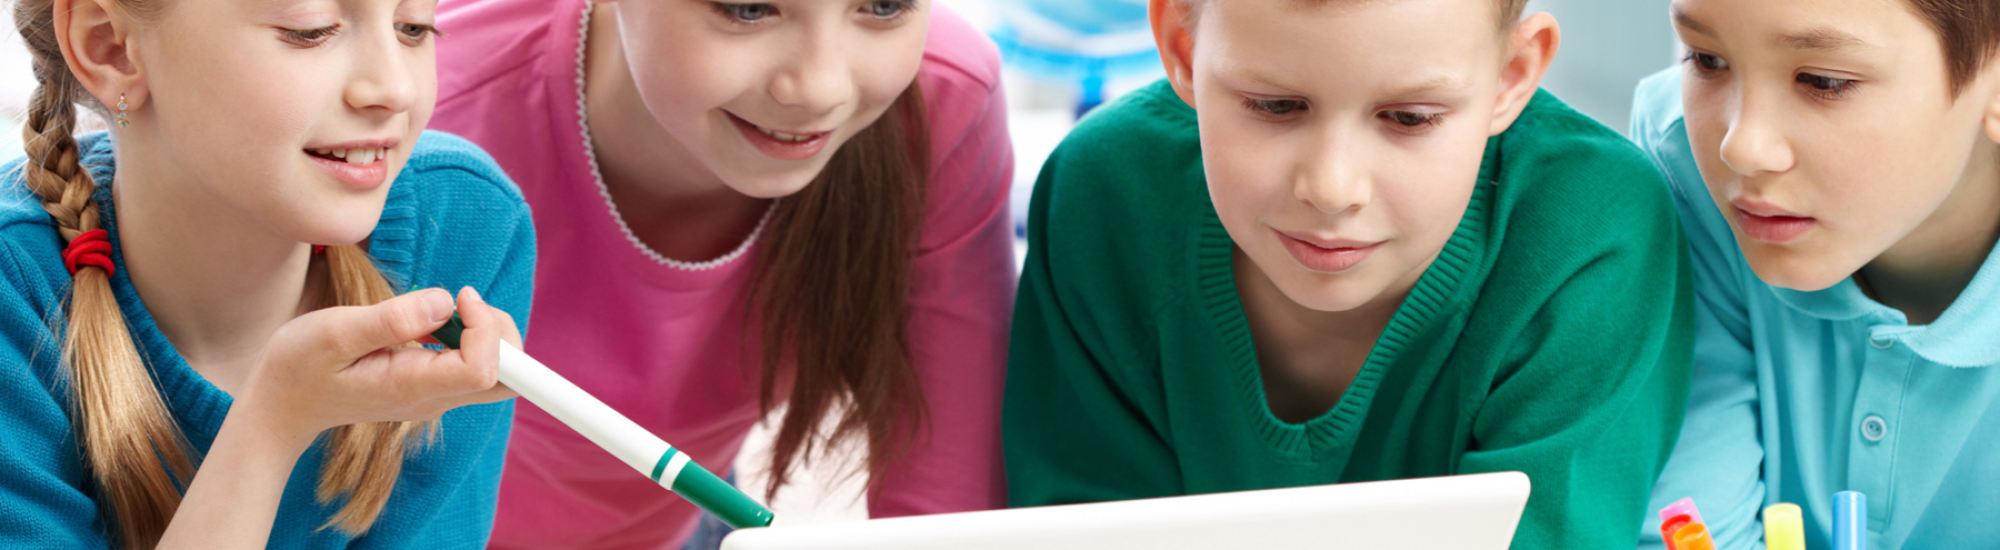 enrollment-childrens-education